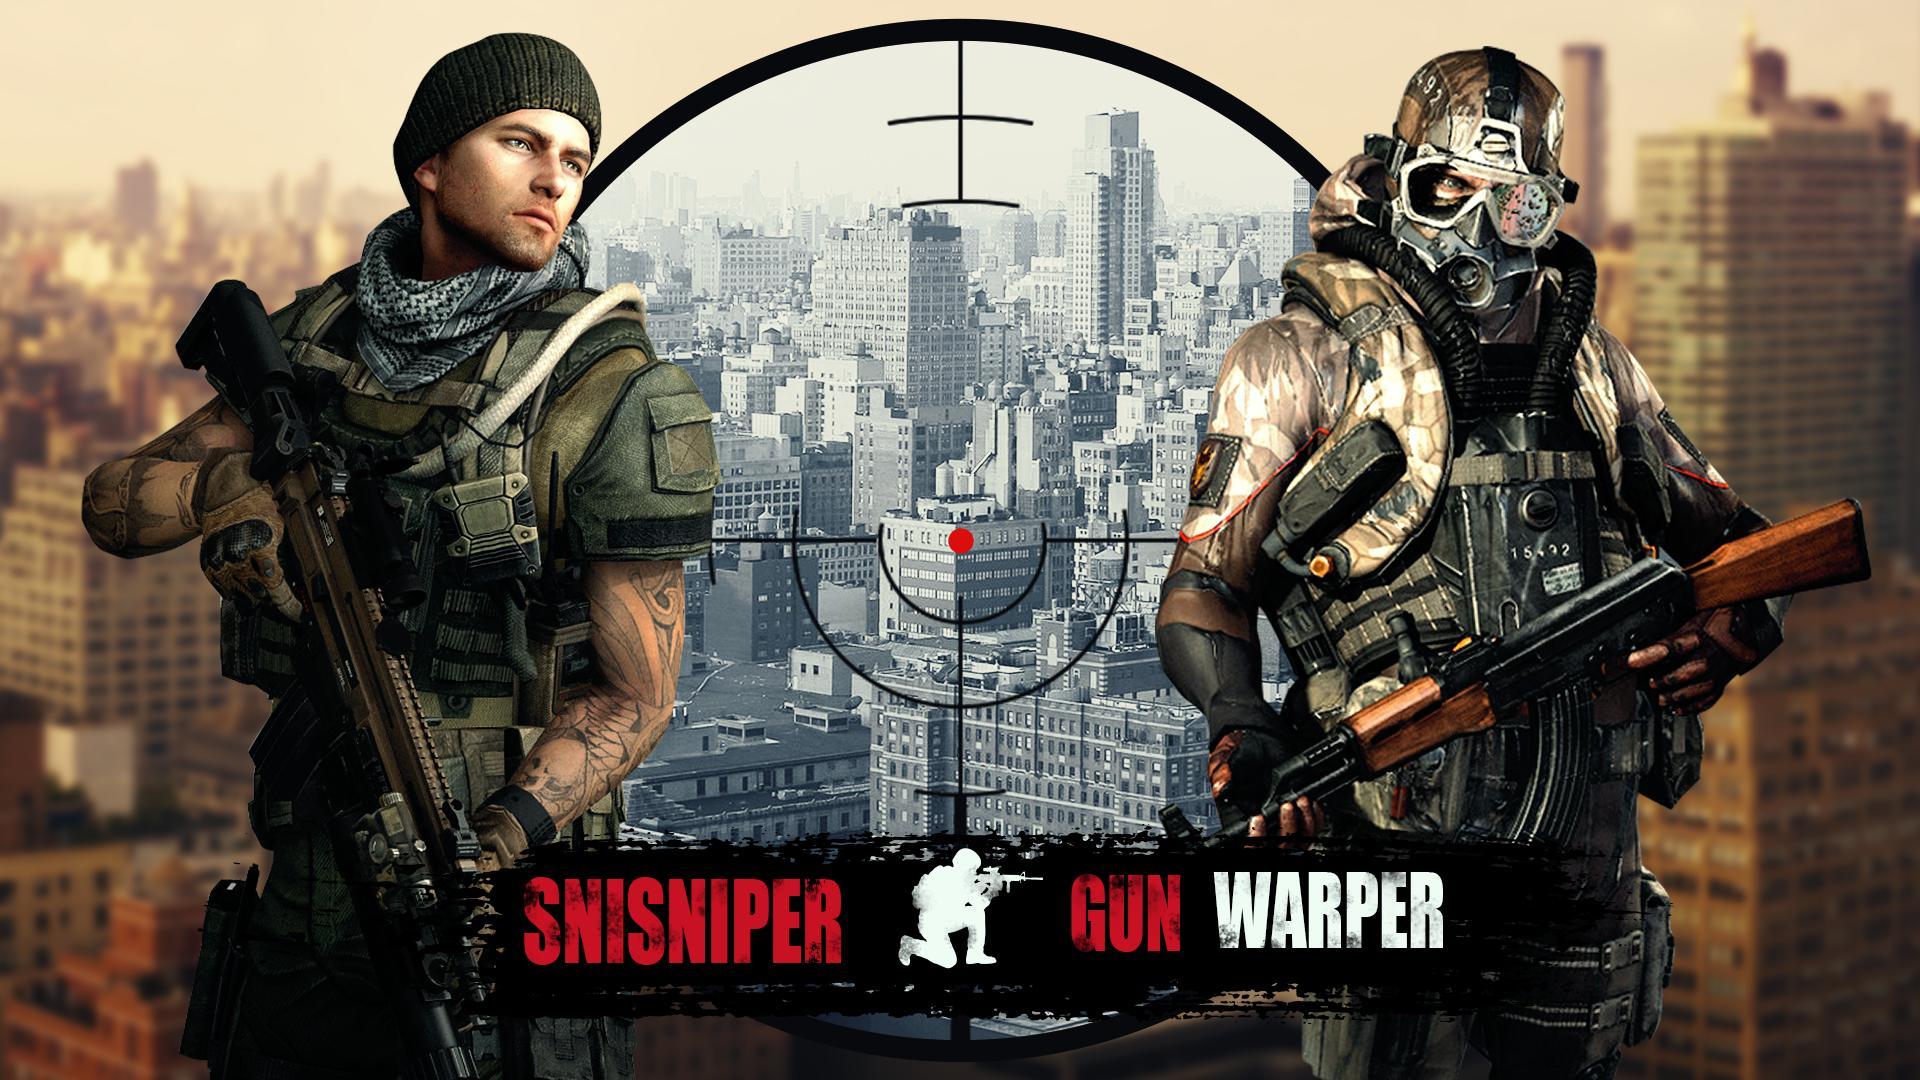 Sniper Gun War for Android - APK Download